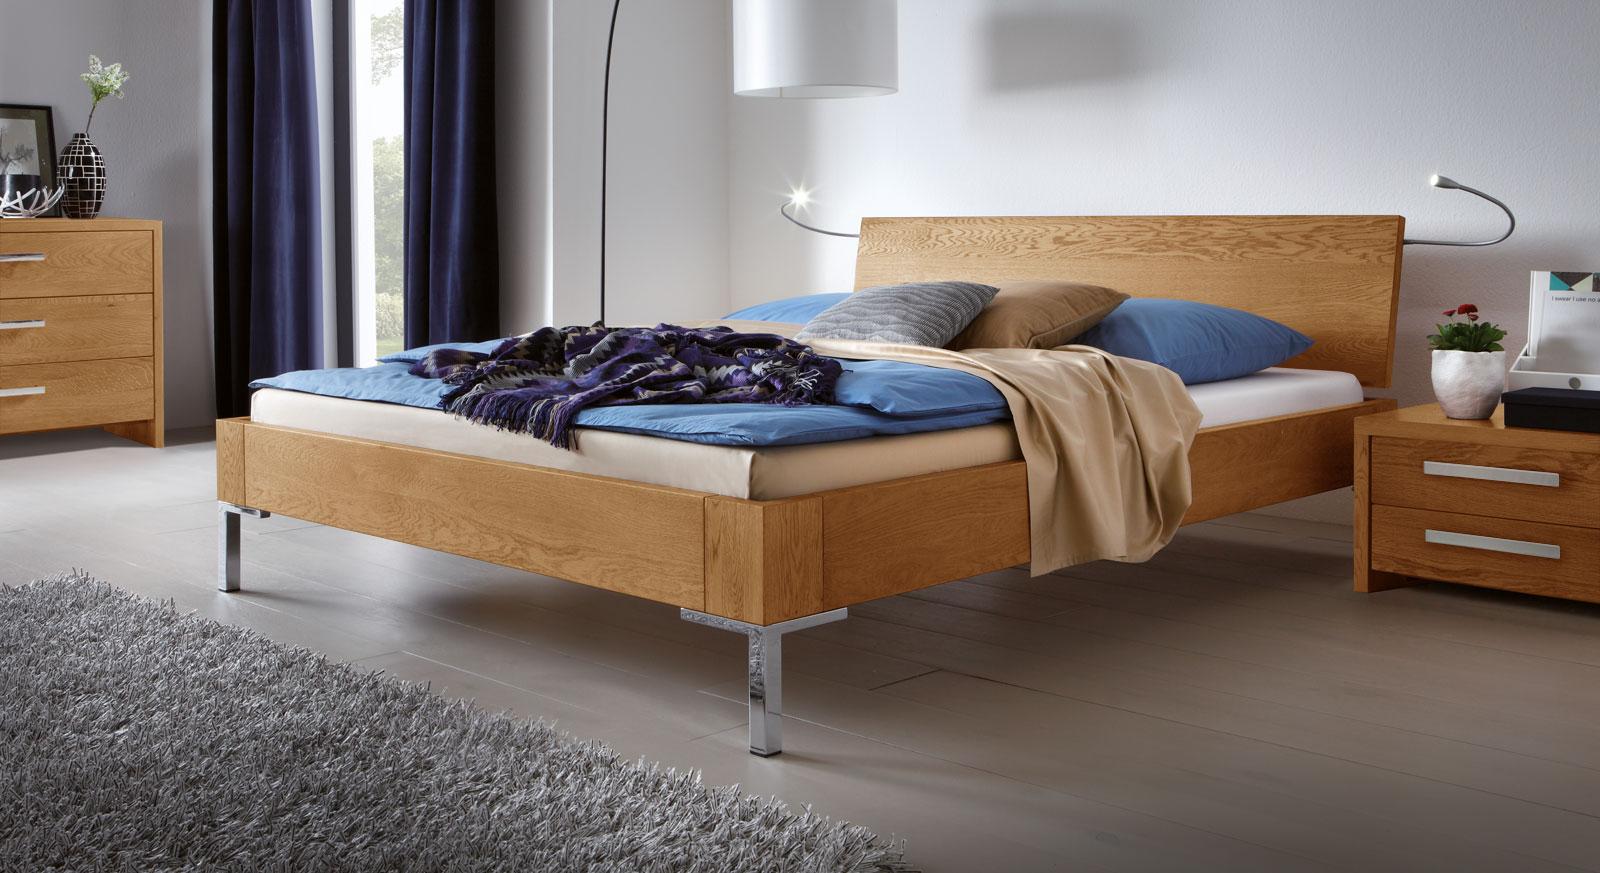 massives bett in 140x200 cm fl che eichenbett stockholm. Black Bedroom Furniture Sets. Home Design Ideas